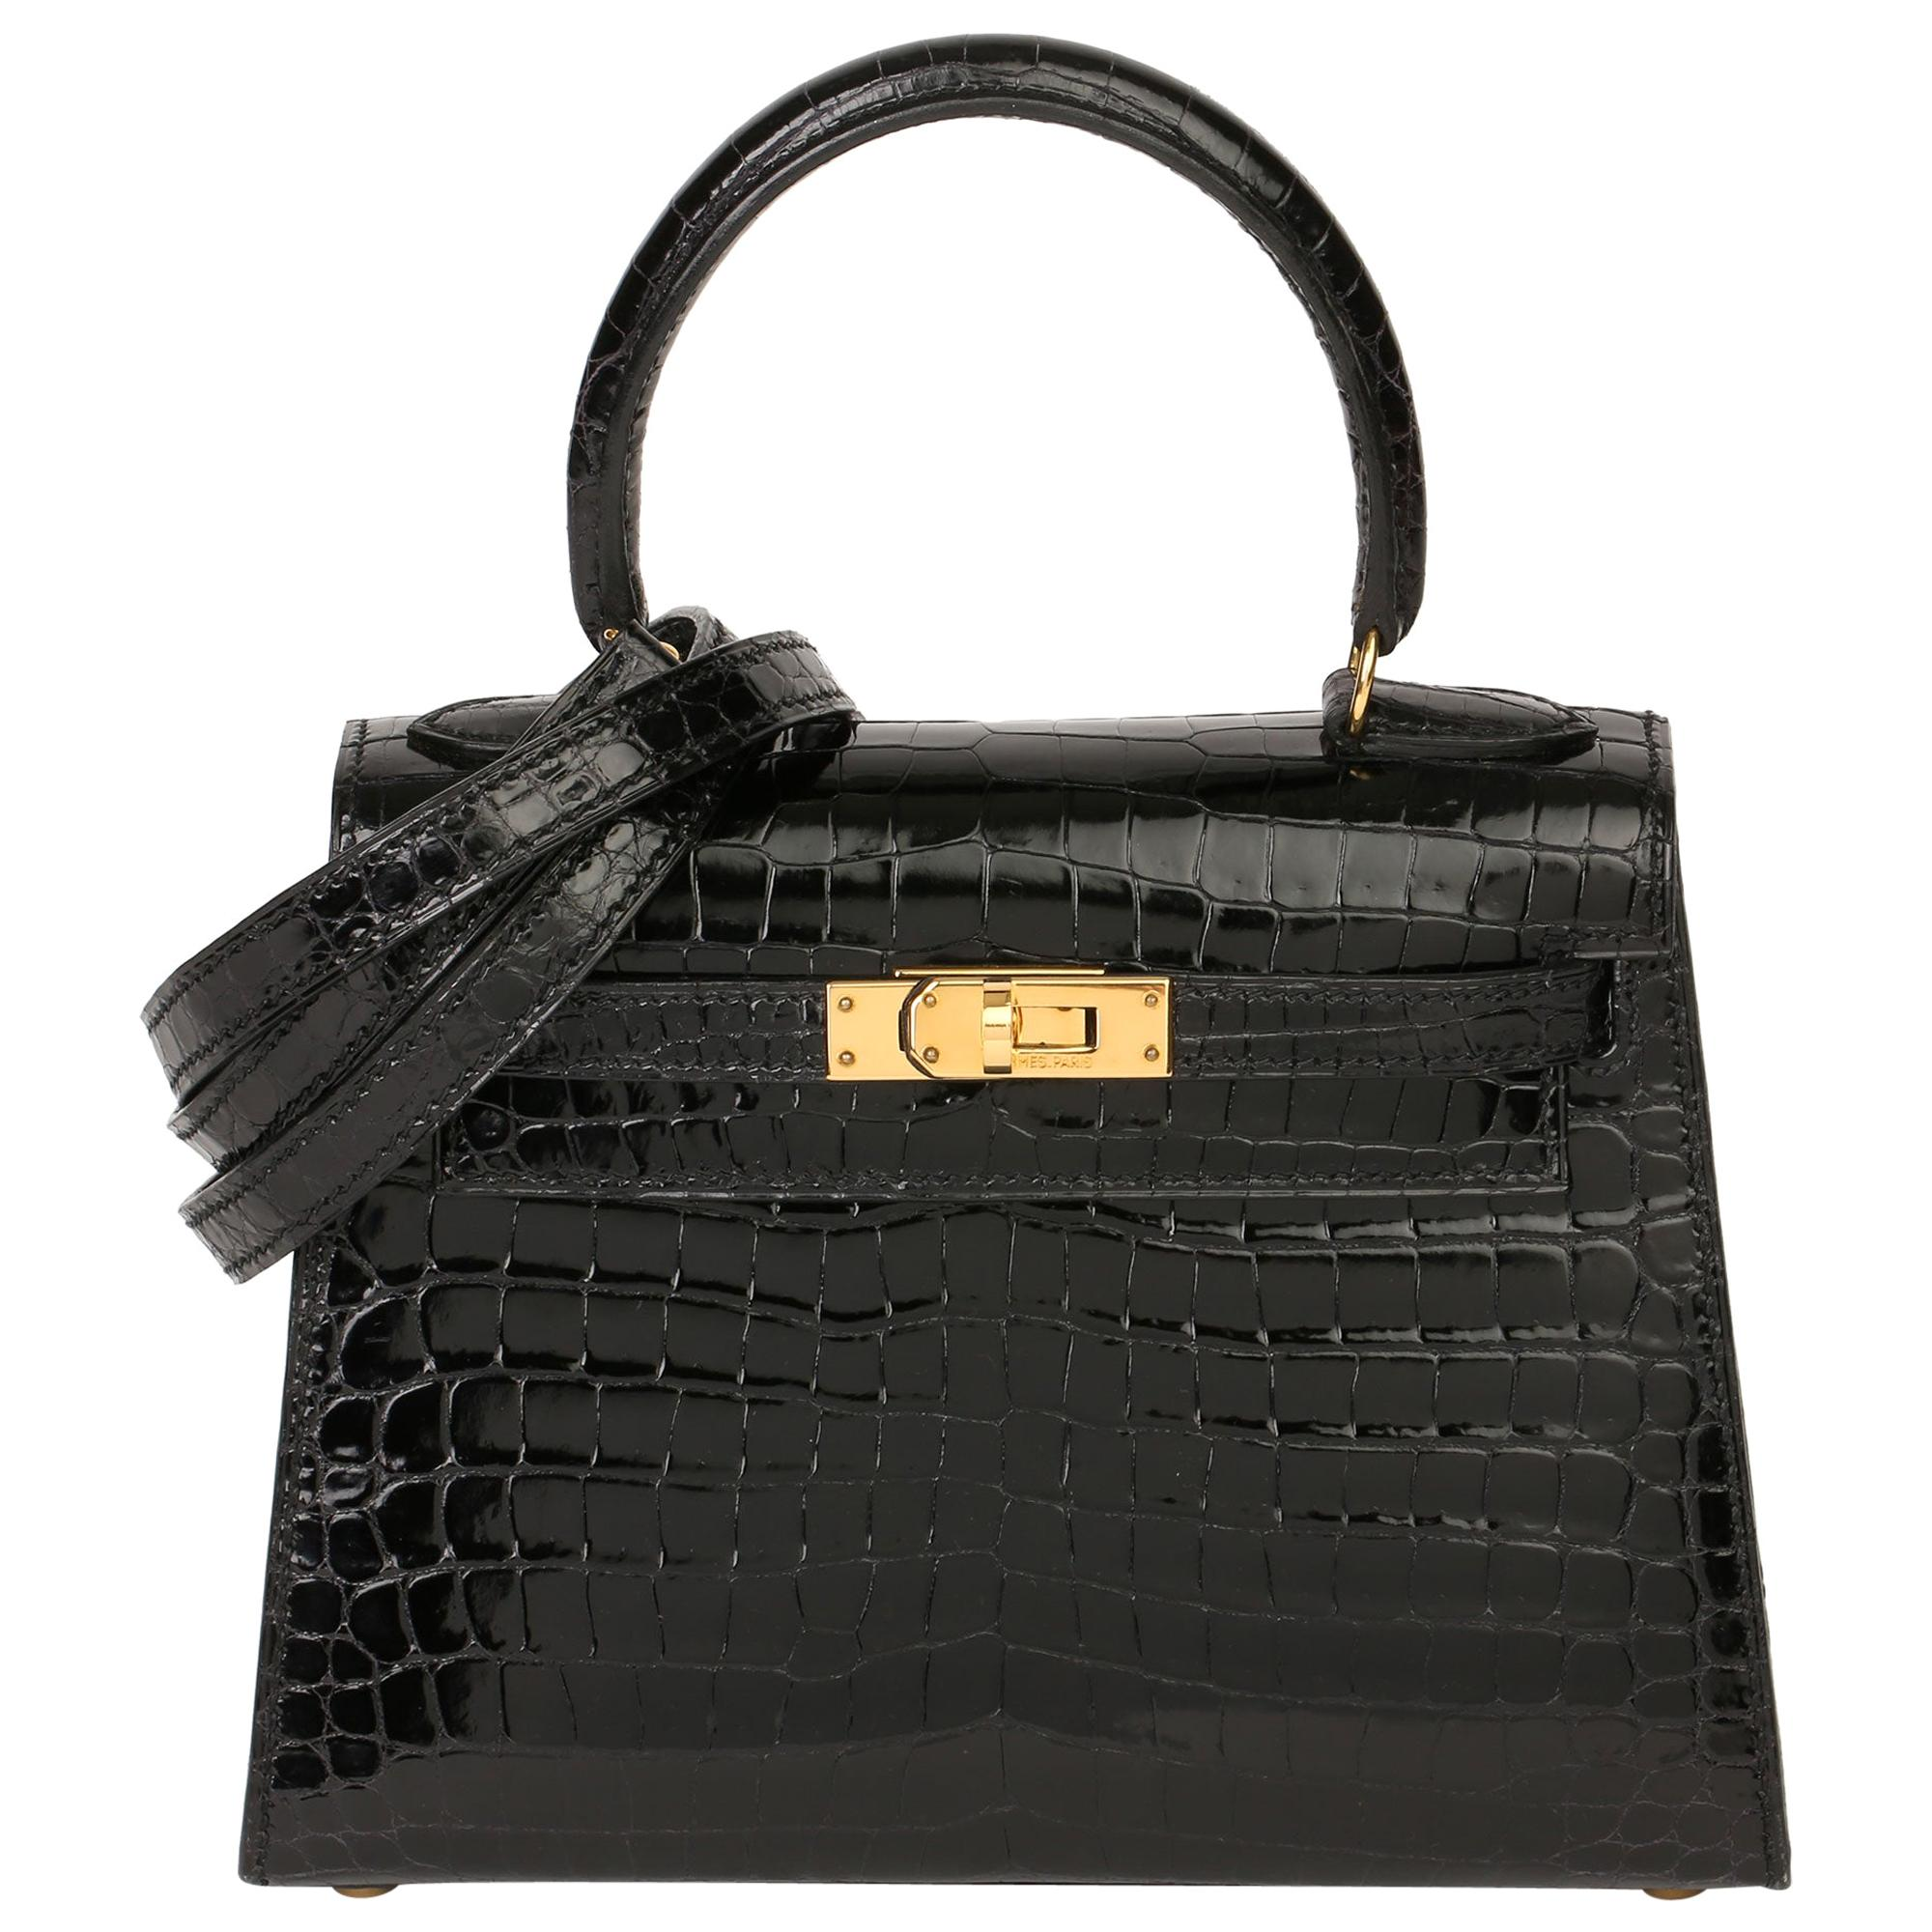 2000 Hermès Black Shiny Porosus Crocodile Leather Vintage Kelly 20cm Sellier